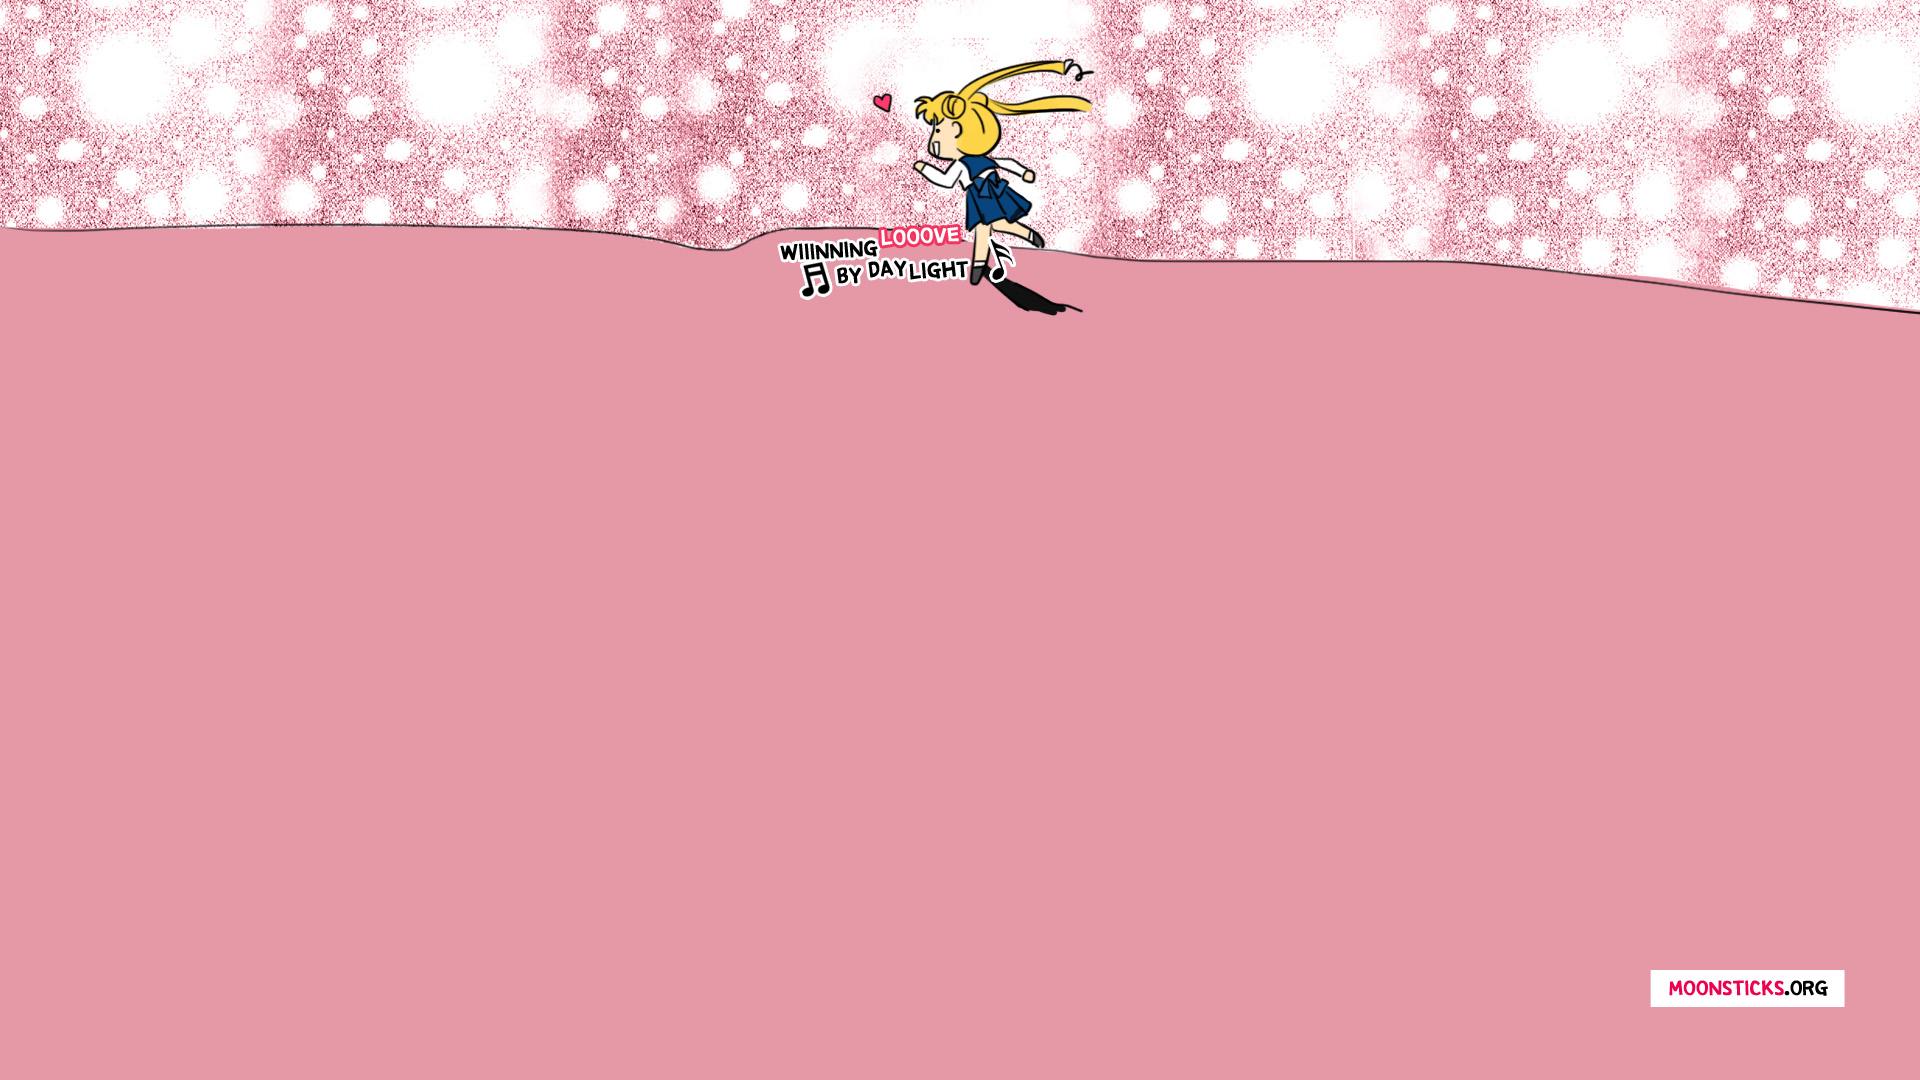 Fall Wallpaper For Desktop 1920x1080 New Sailor Moon 2015 Wallpapers Moonsticks